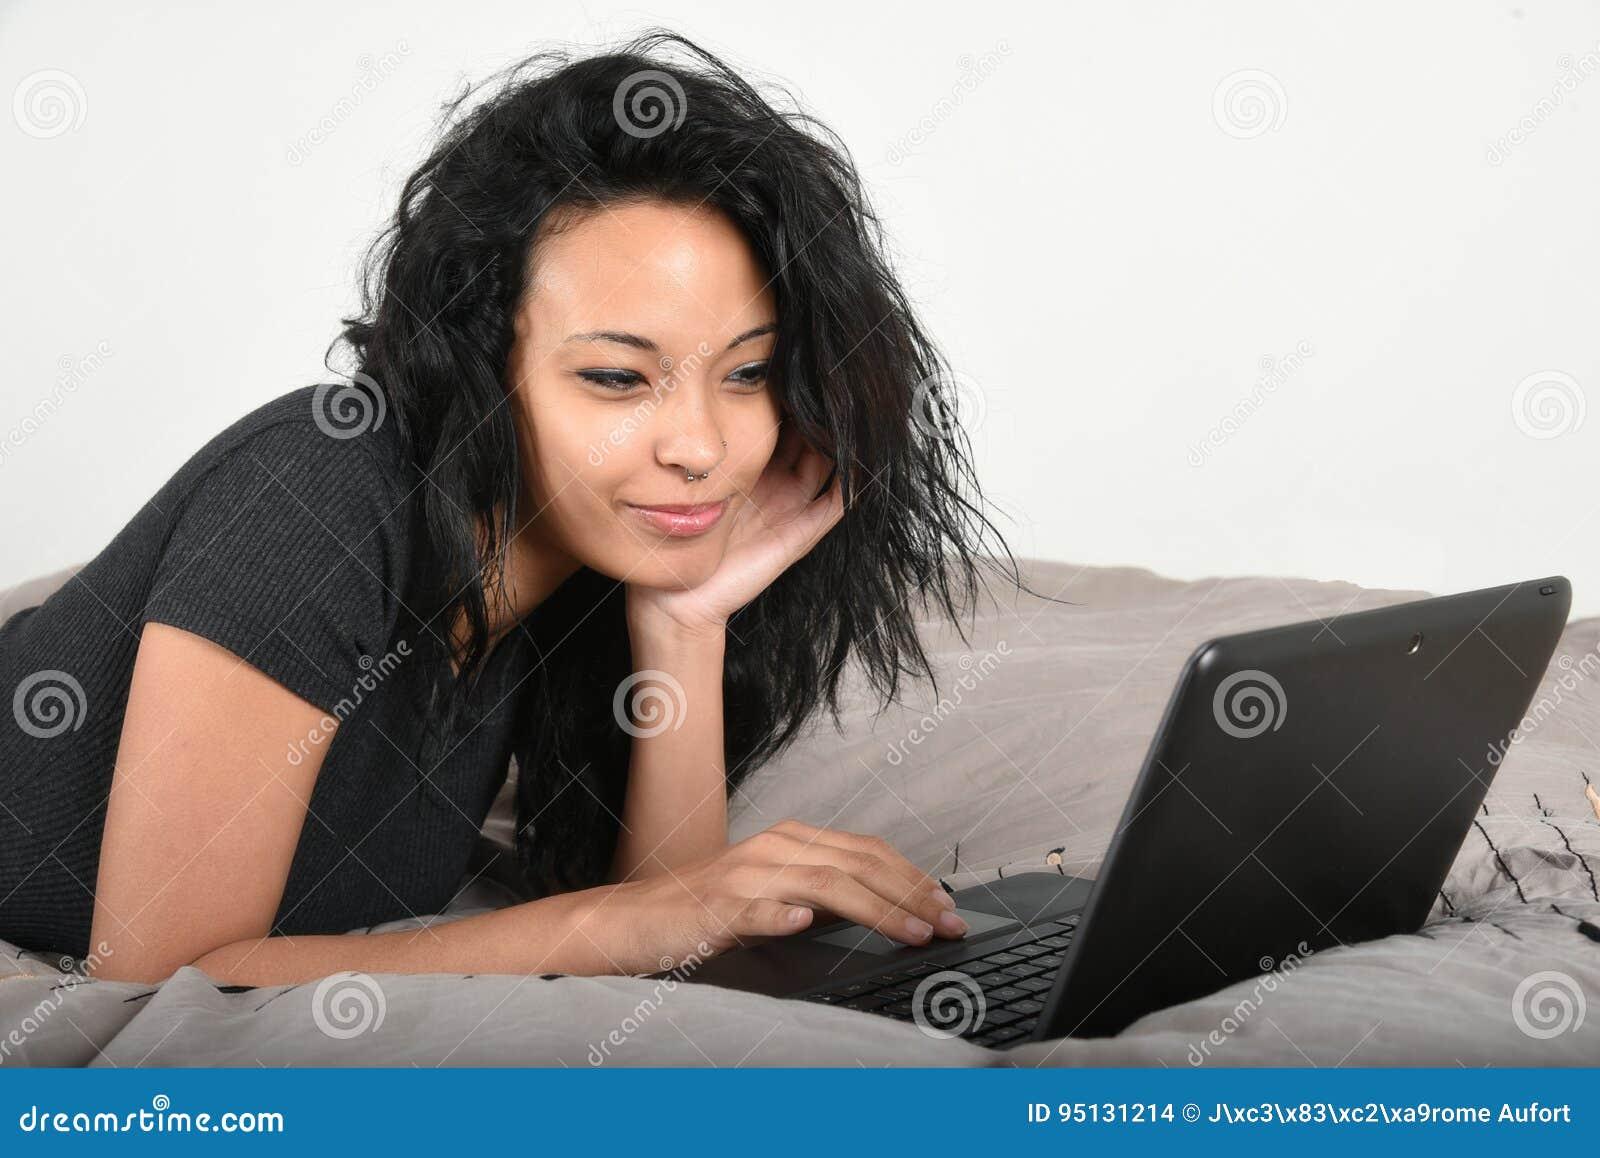 dating site.net homofil dating sites Vietnam